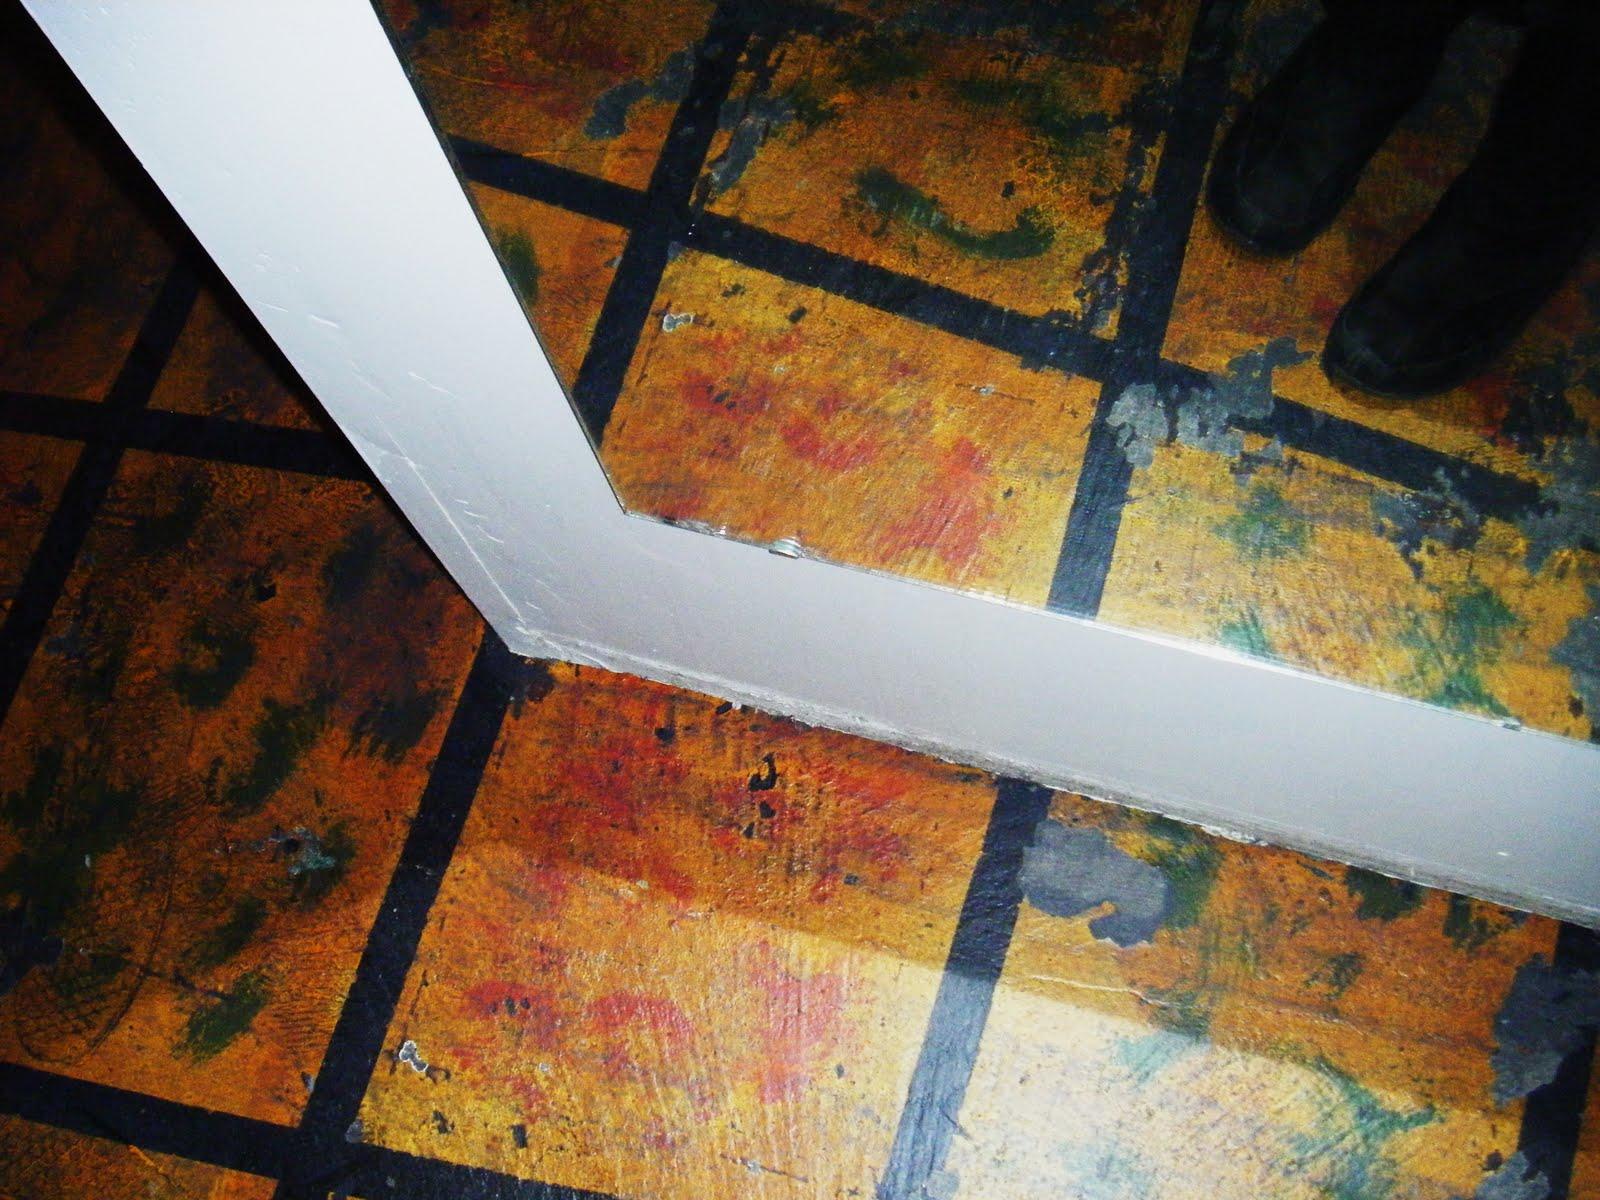 Sticky Painted Floor